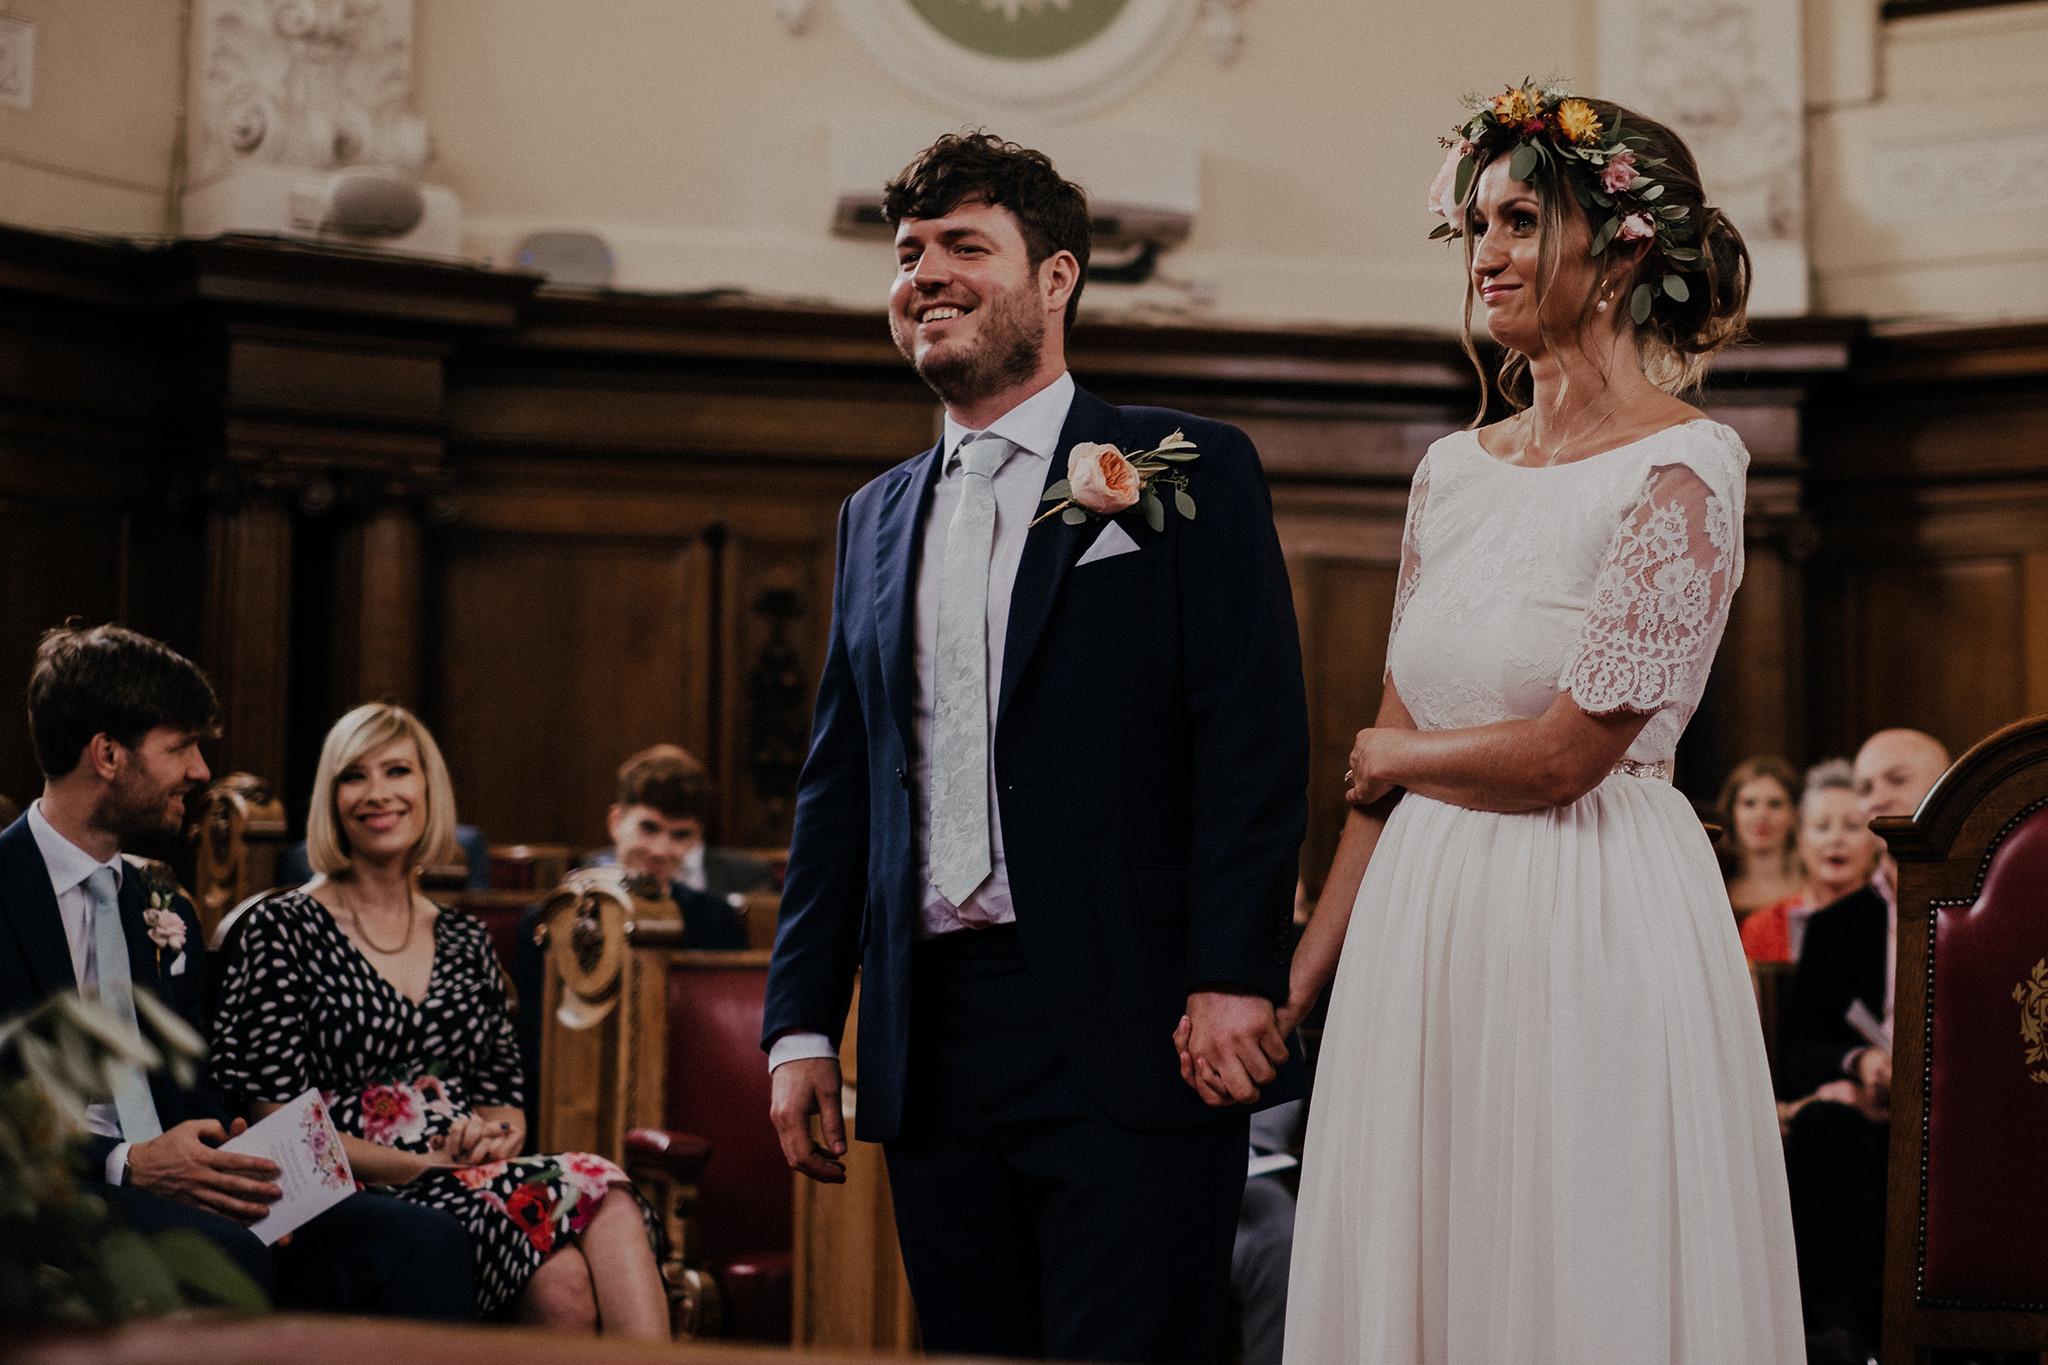 Islington-town-hall-wedding29.jpg